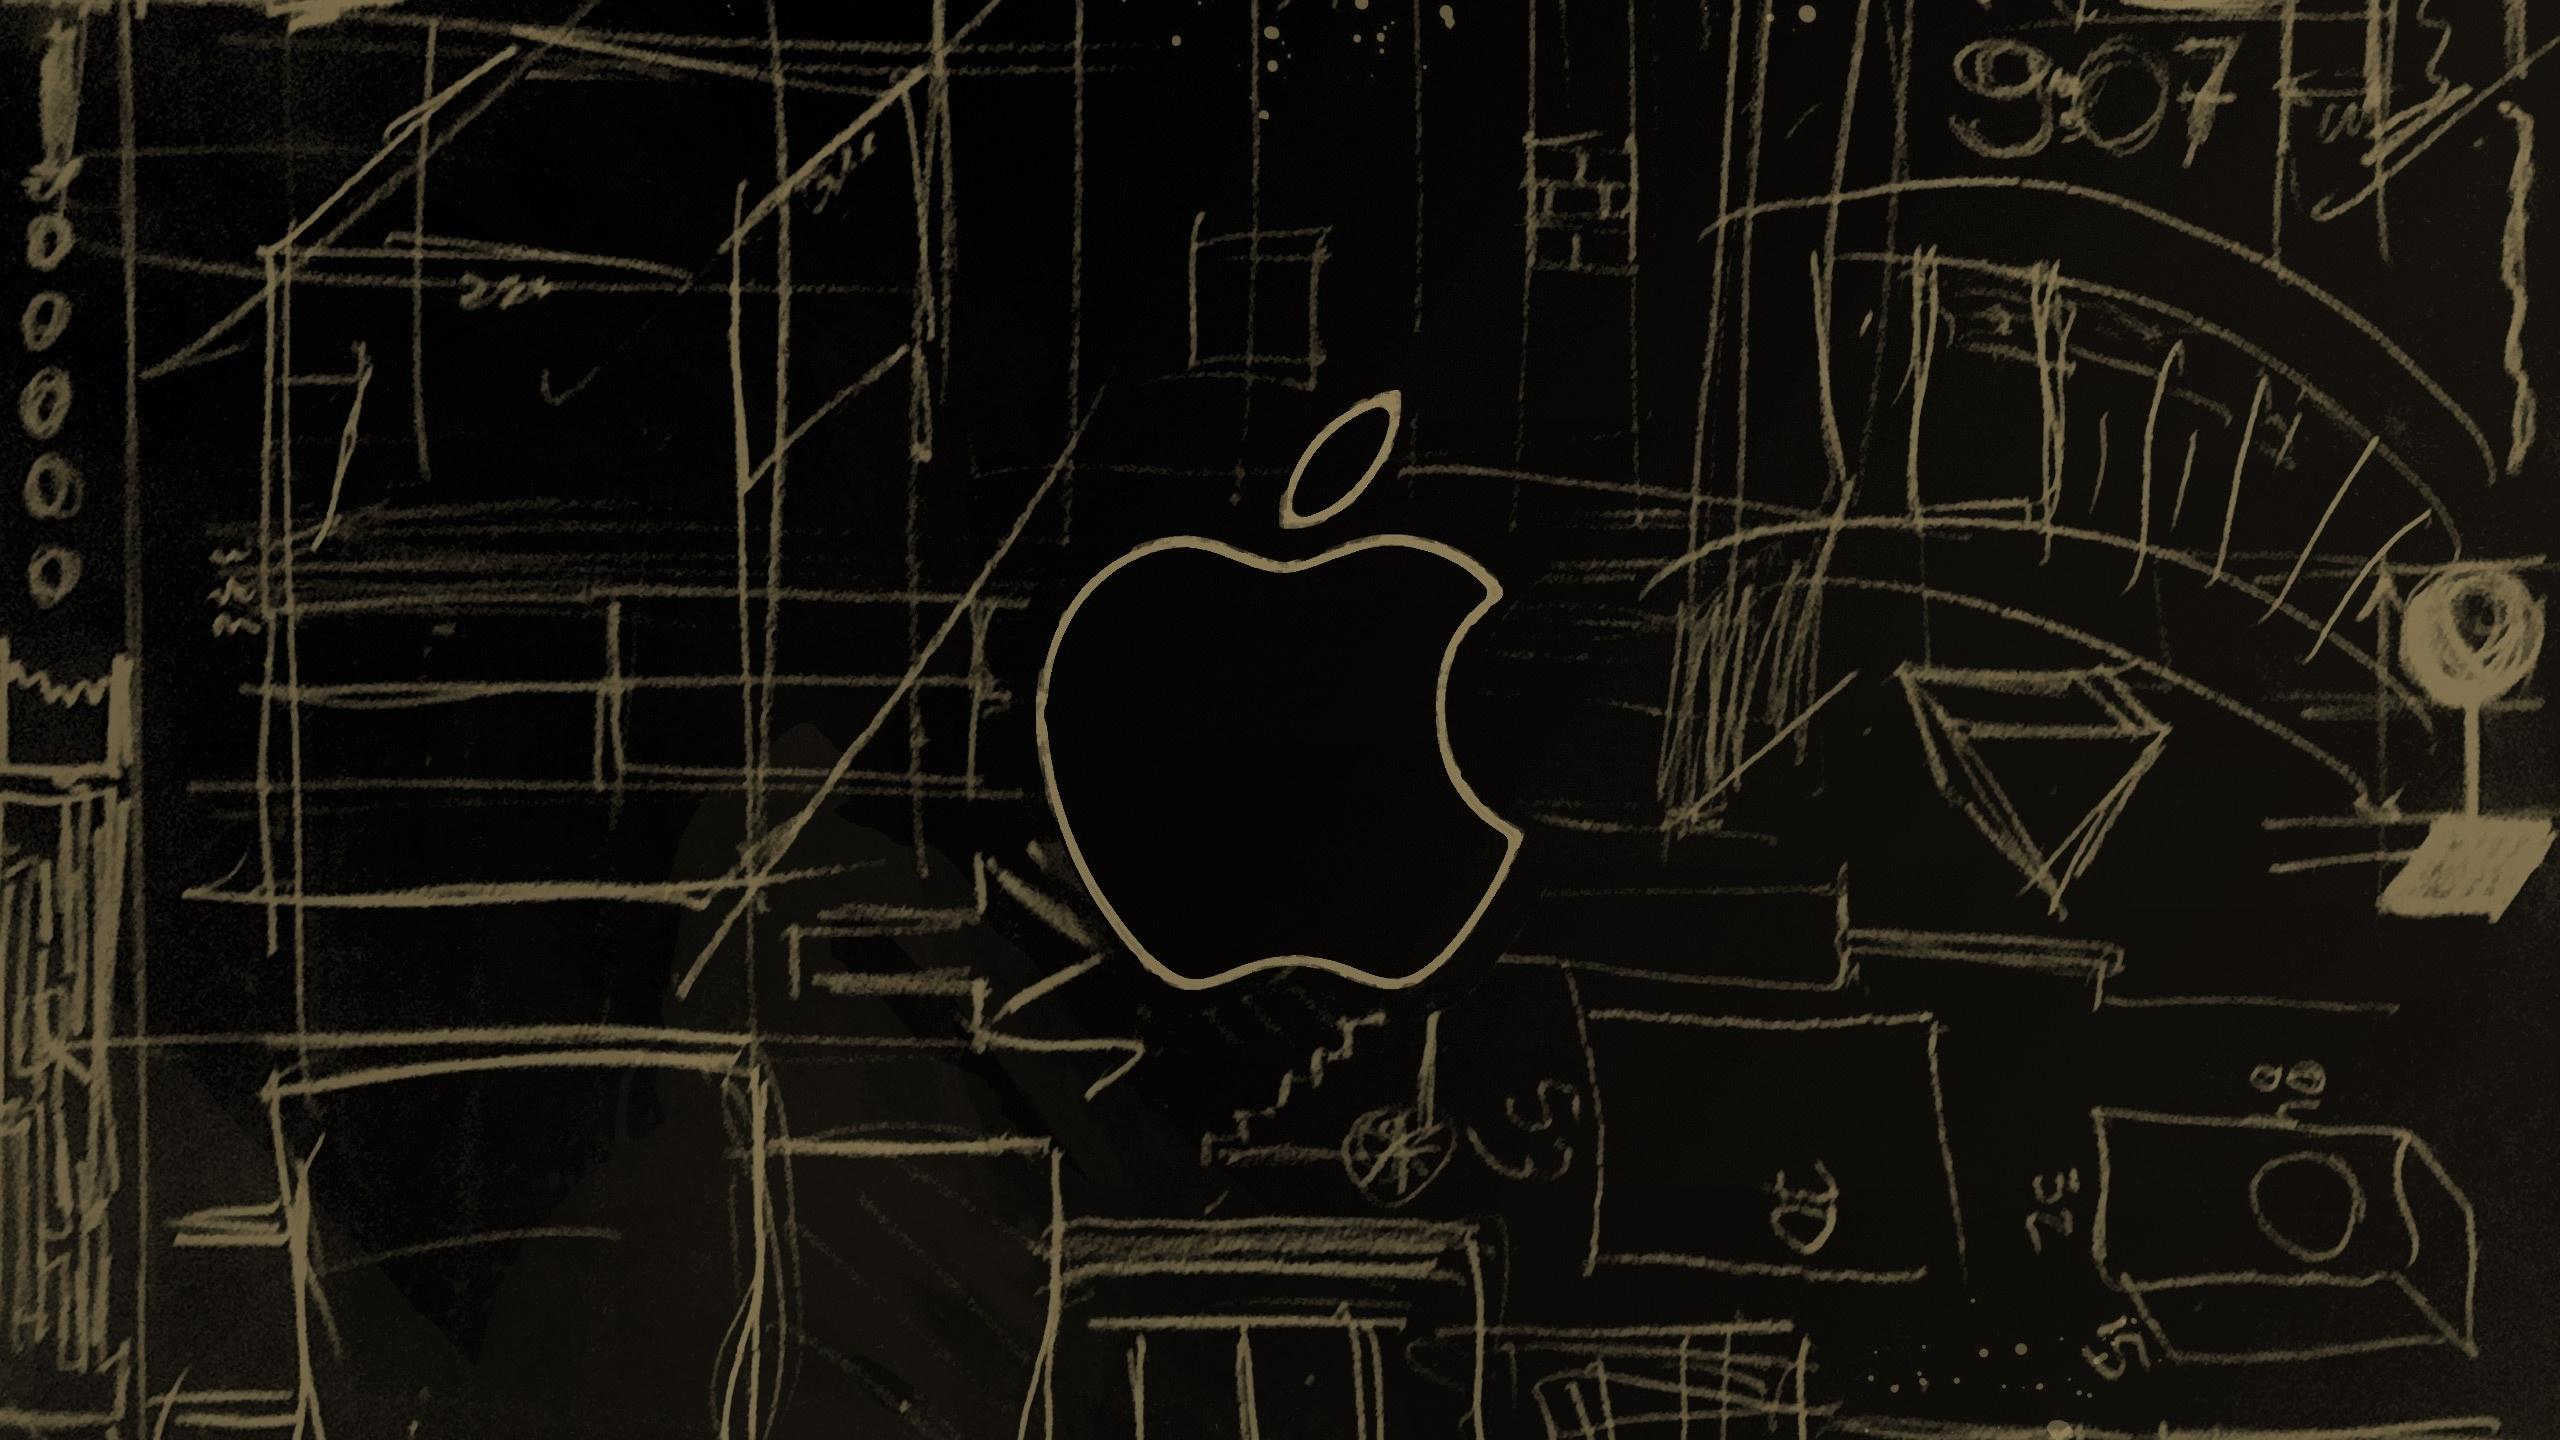 iOS 11 Wallpaper by hs1987 on DeviantArt